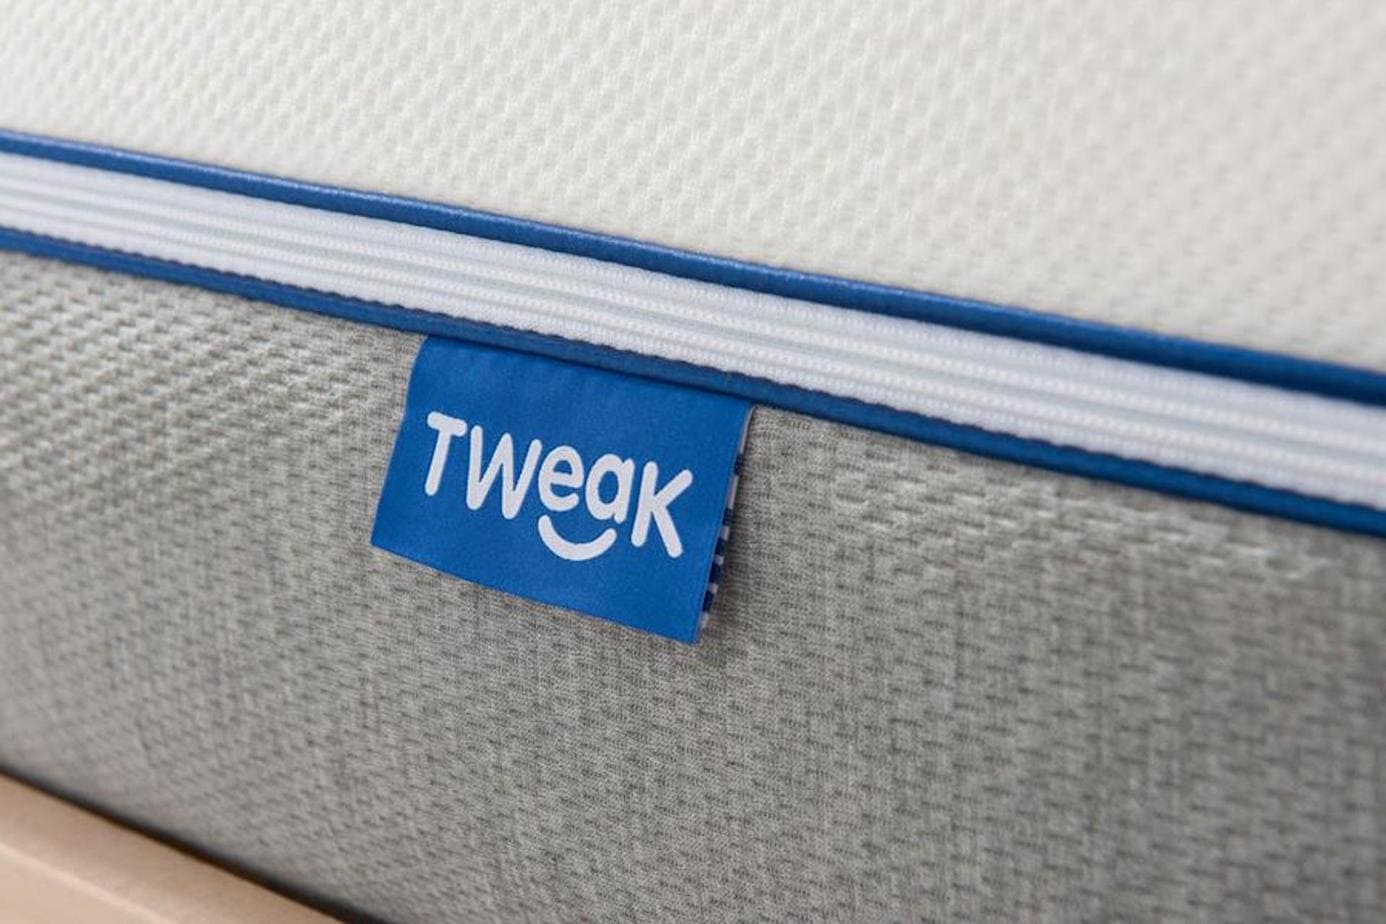 Tweak mattress label